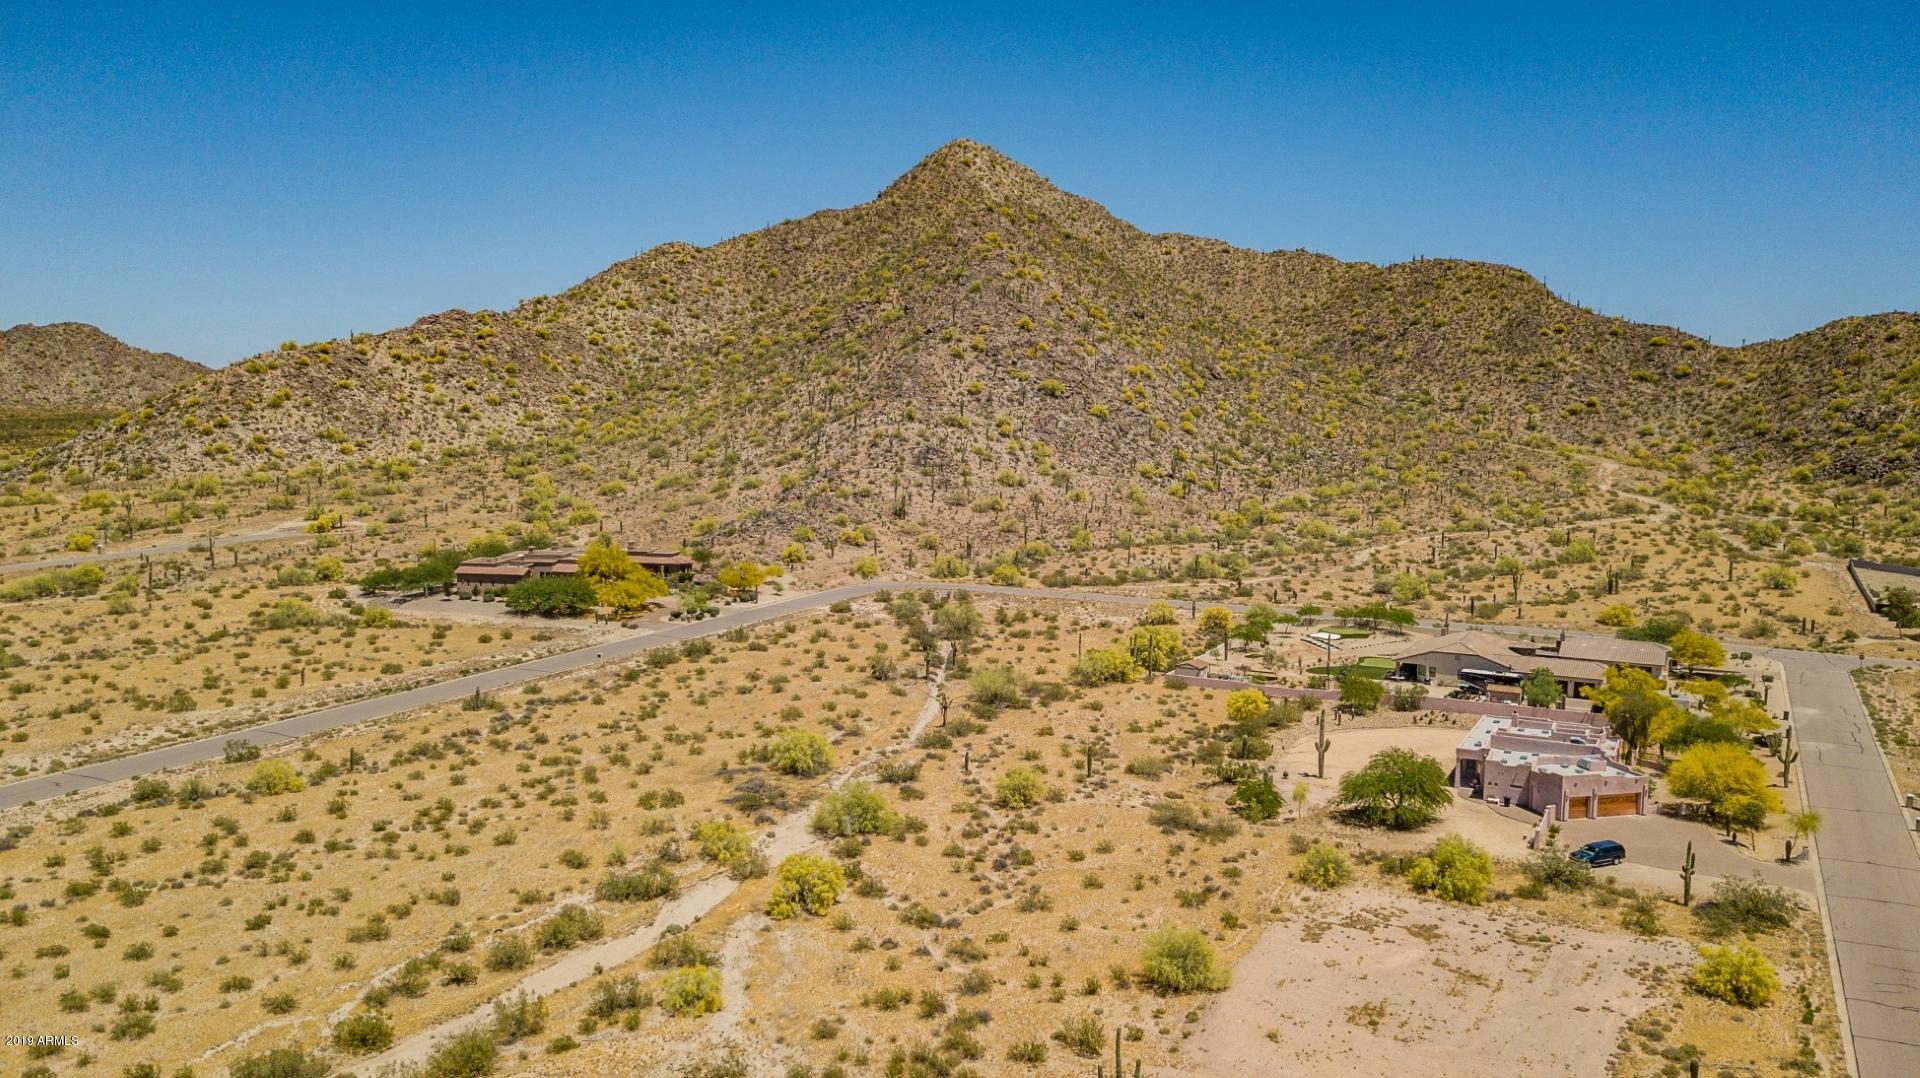 9341 W PASEO LOMA --, Casa Grande, Arizona 85194, ,Lots And Land,For Sale,9341 W PASEO LOMA --,5920991